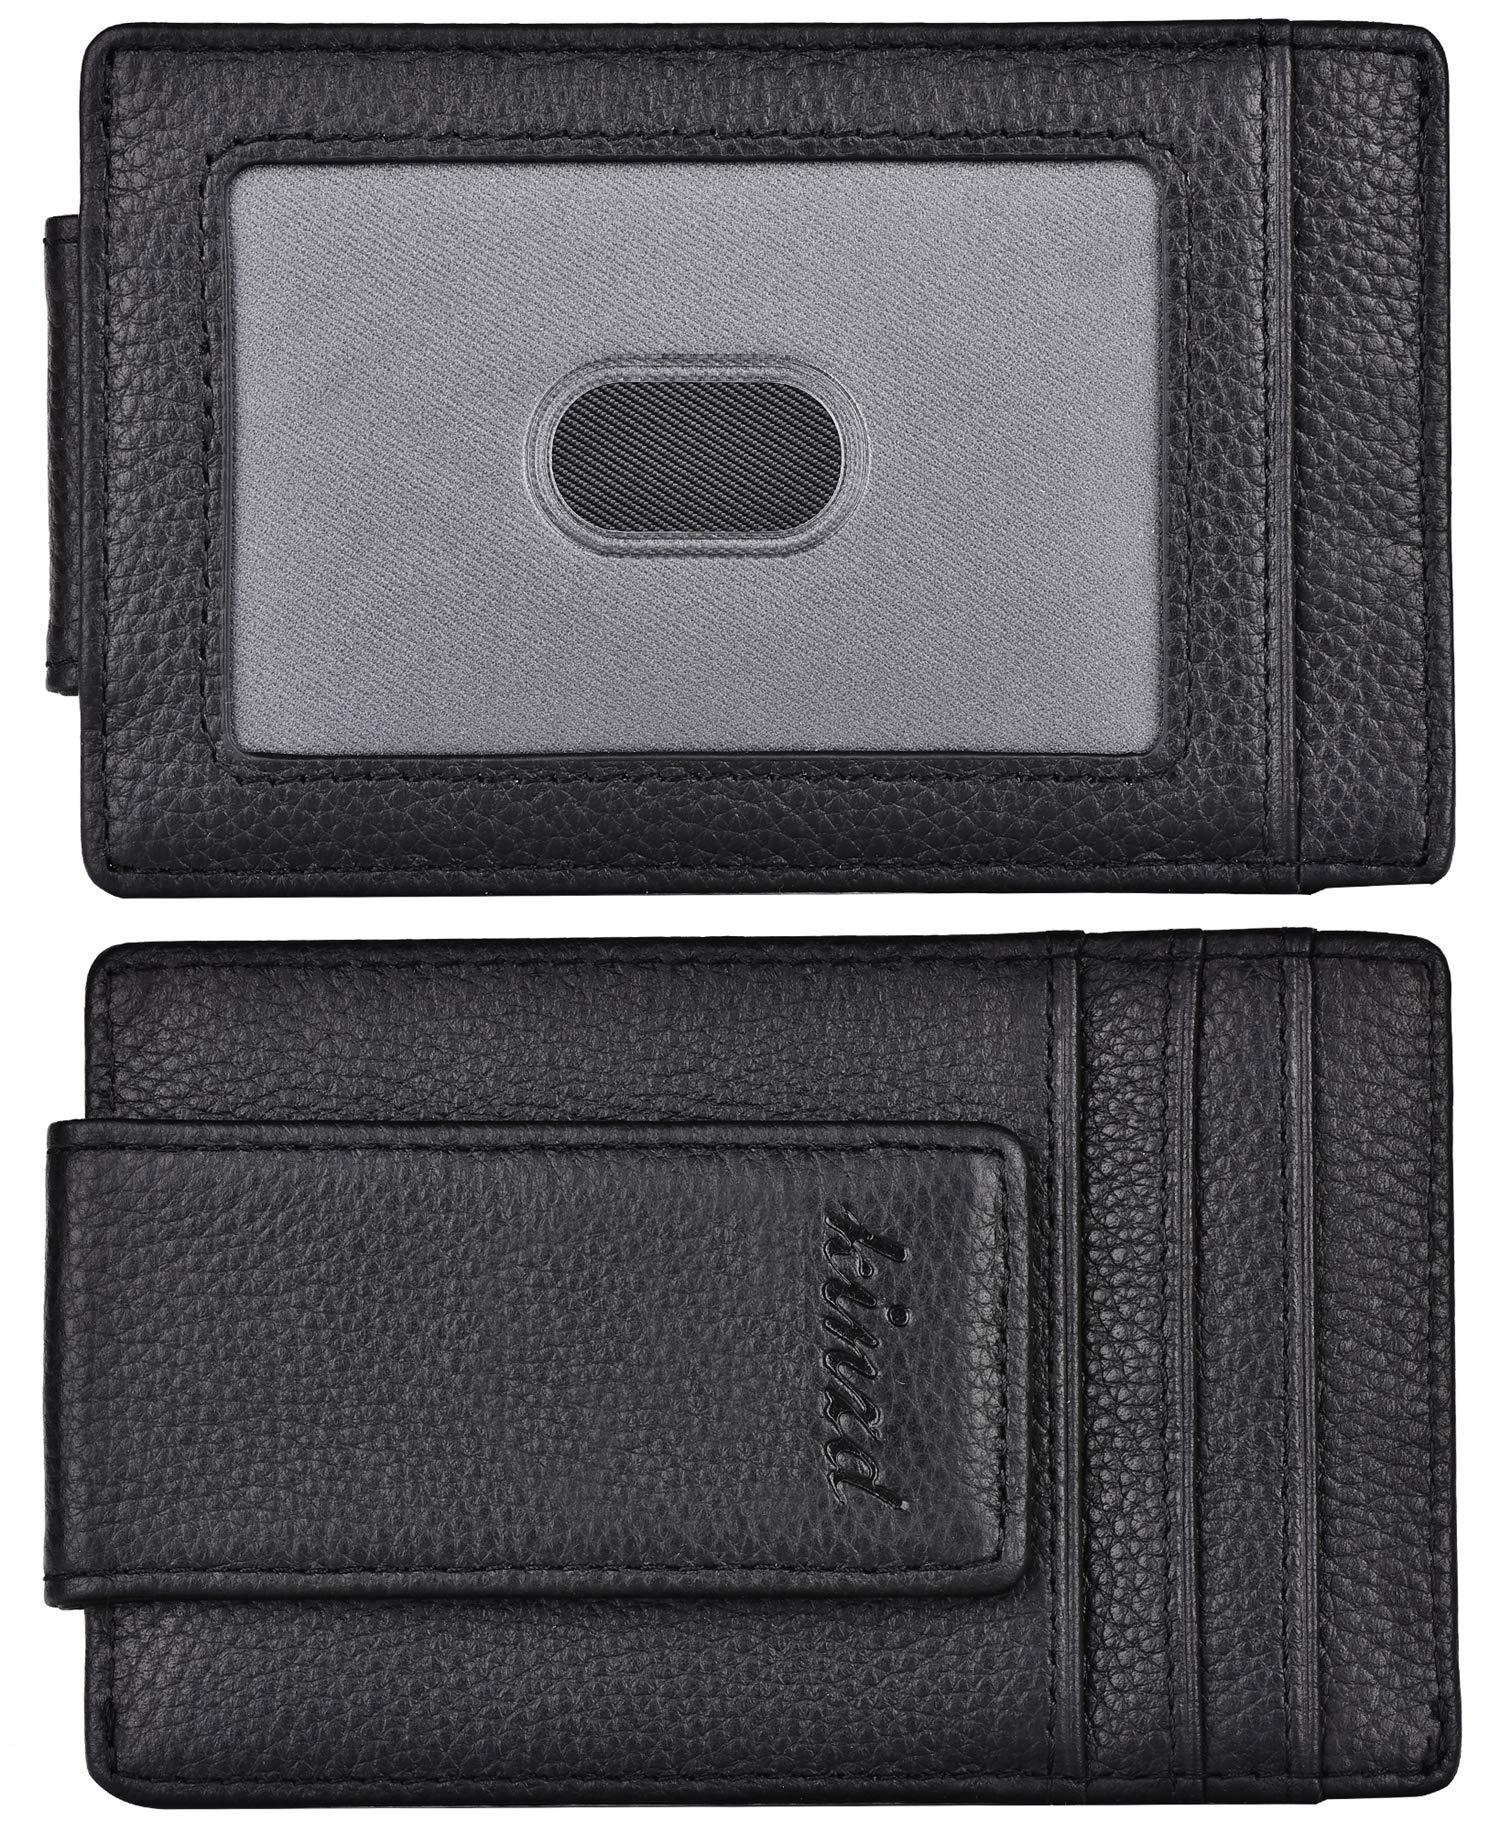 kinzd Pocket Leather Blocking Pattern